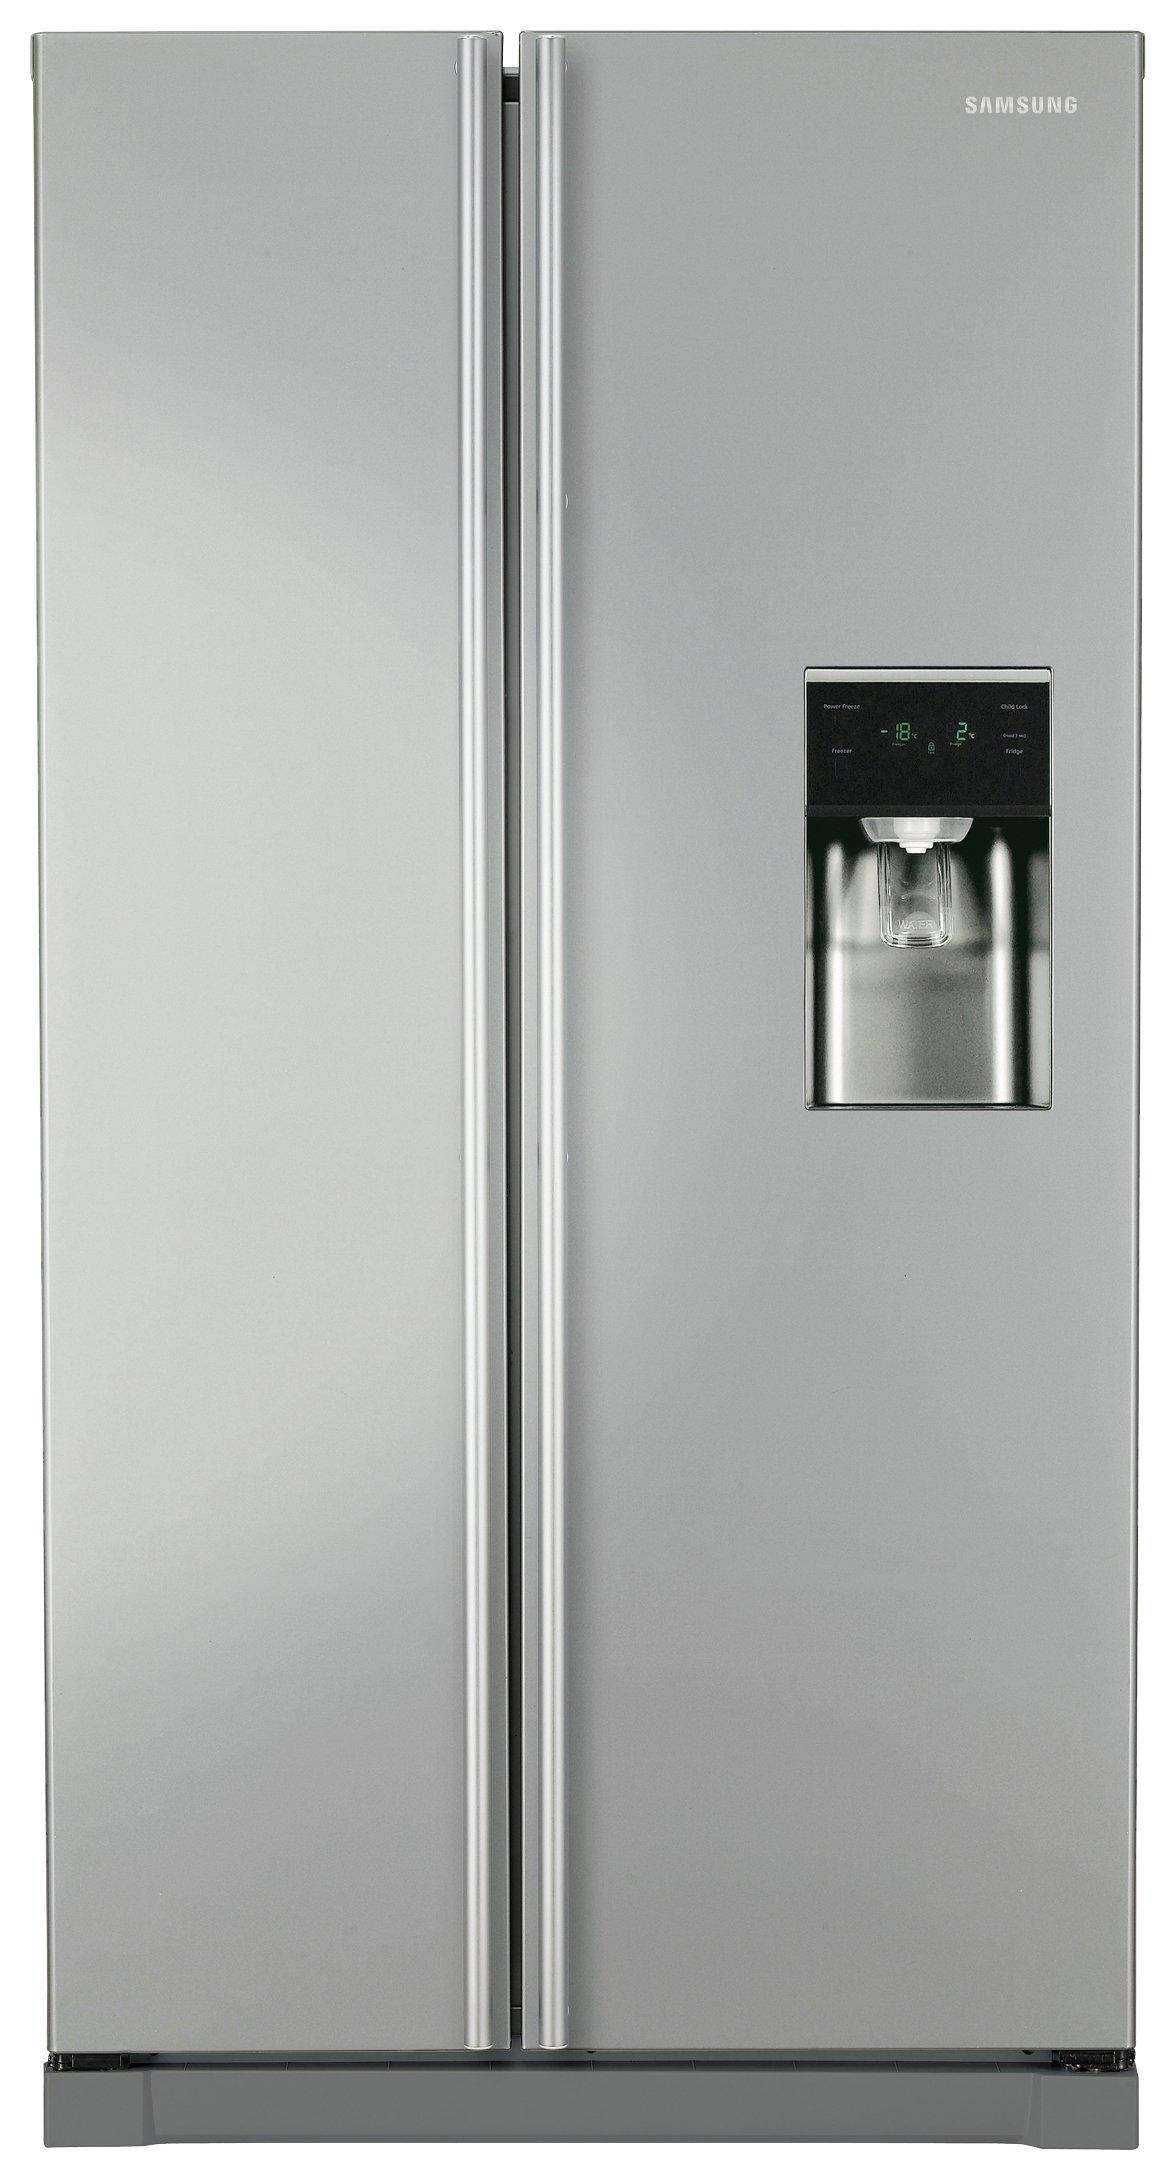 samsung fridge freezer. samsung rsa1rtmg1/xeu american fridge freezer - graphite l